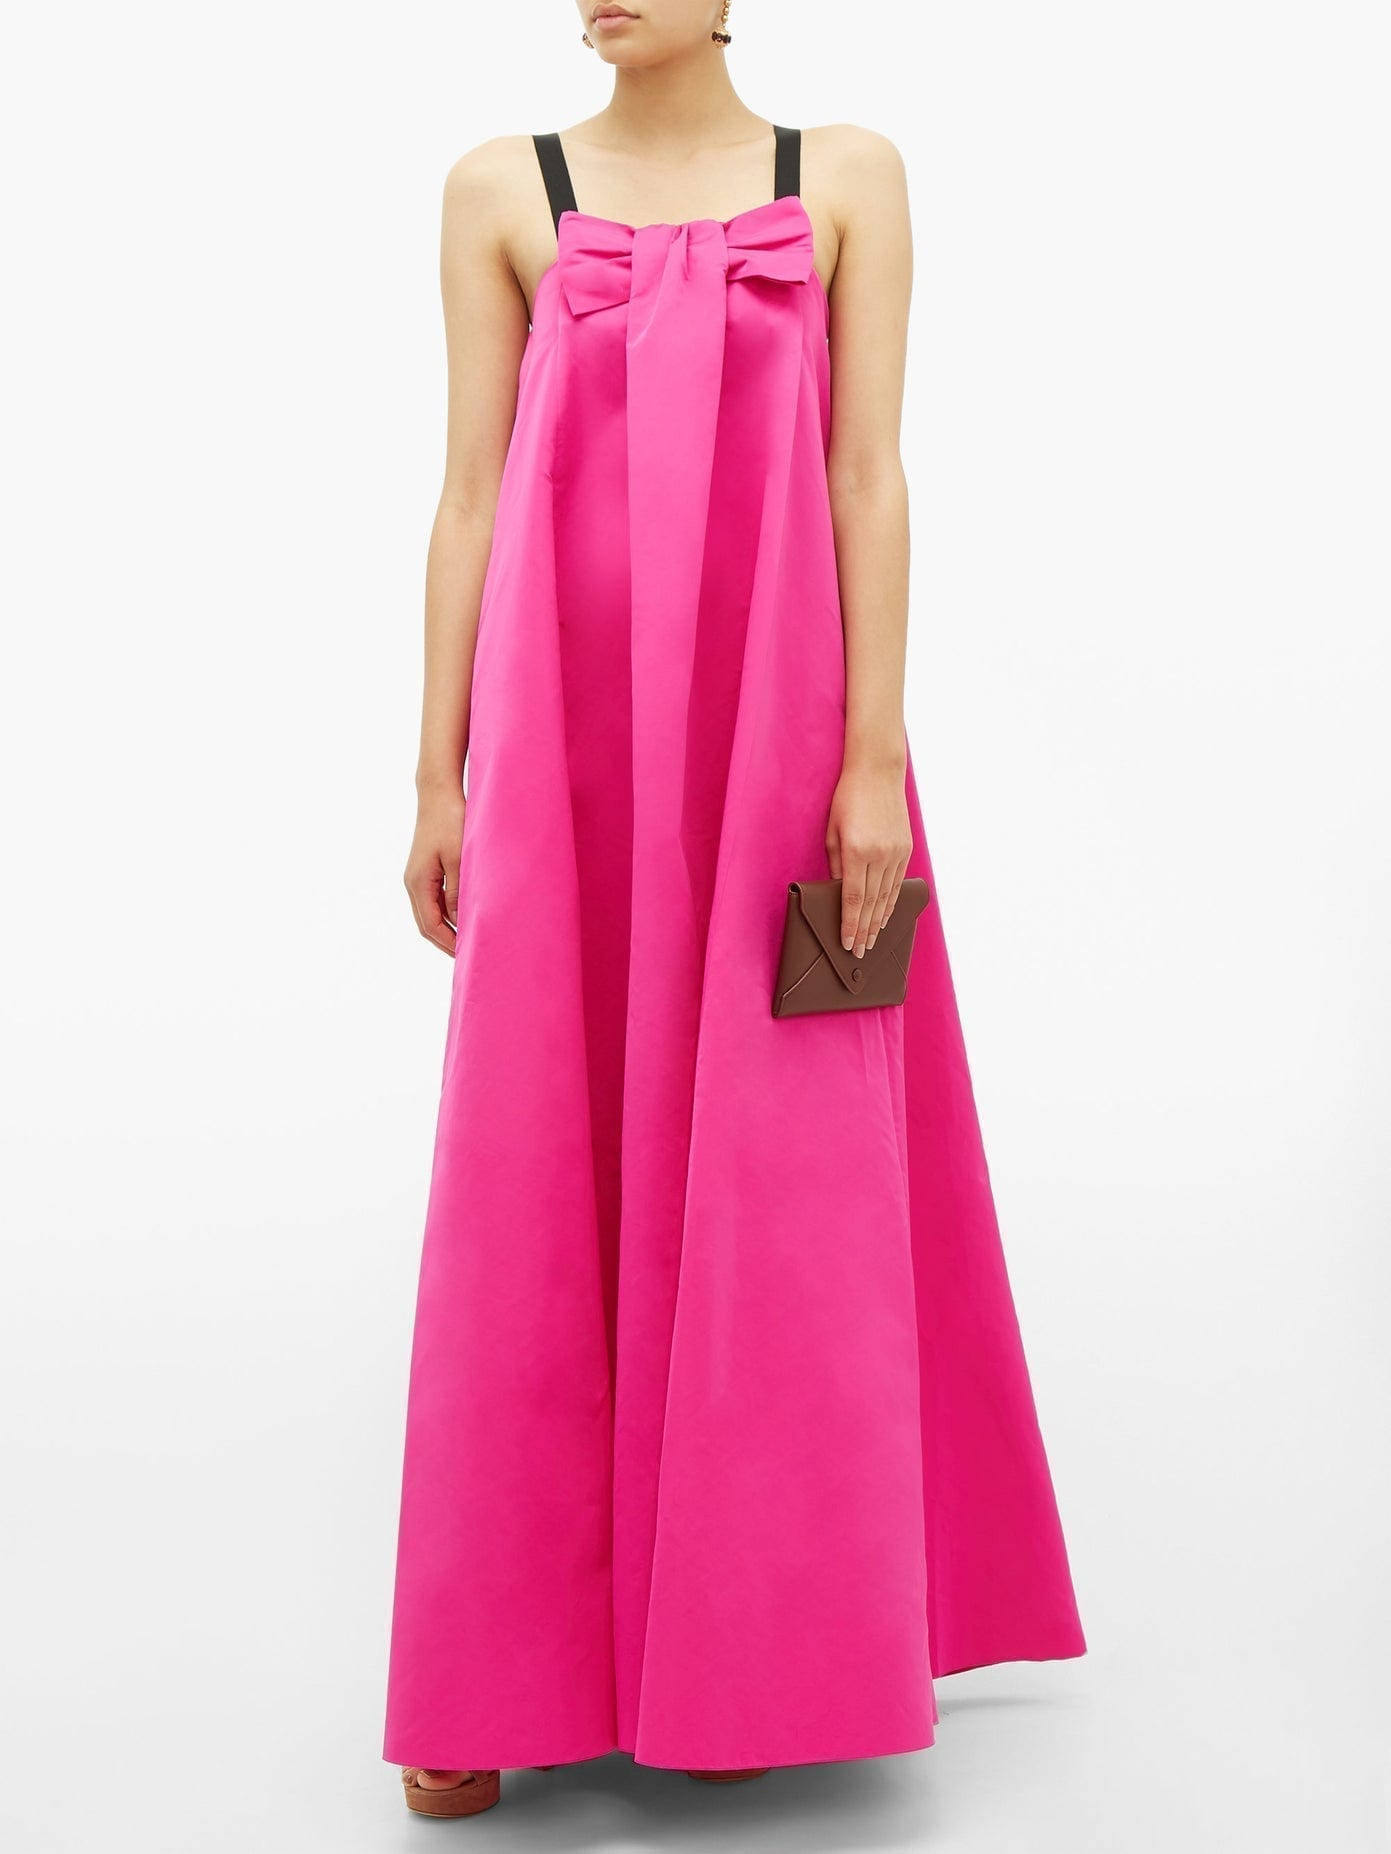 ROCHAS Piastra Radsmir Bow-front Taffeta Gown